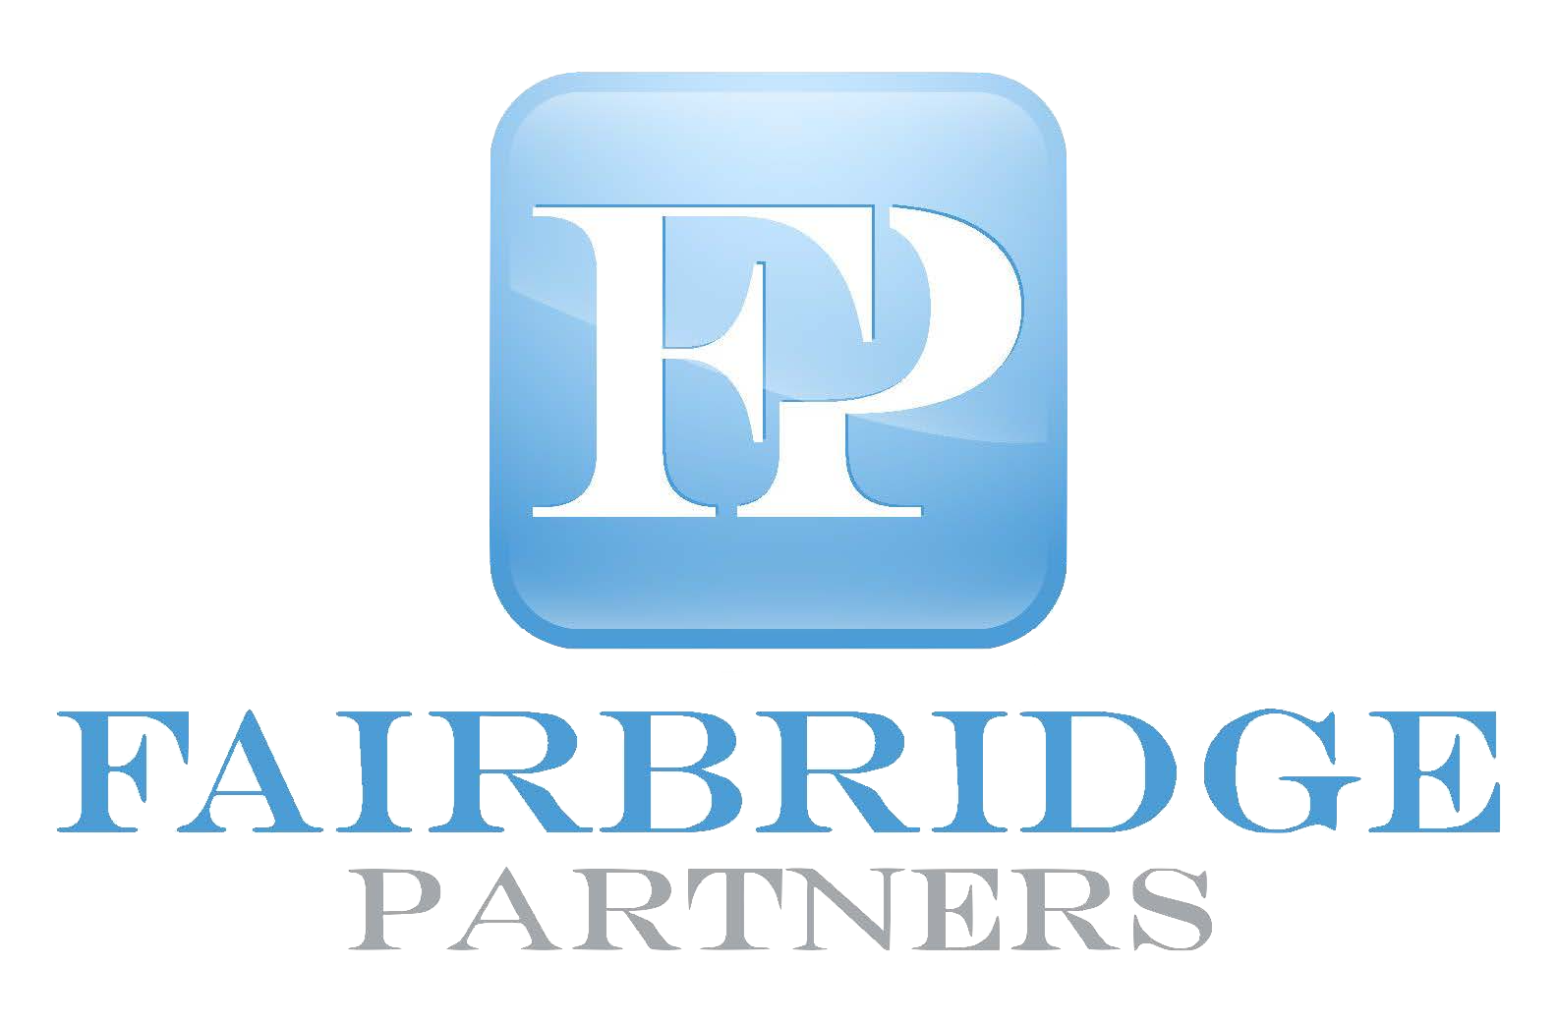 Fairbridge Partners